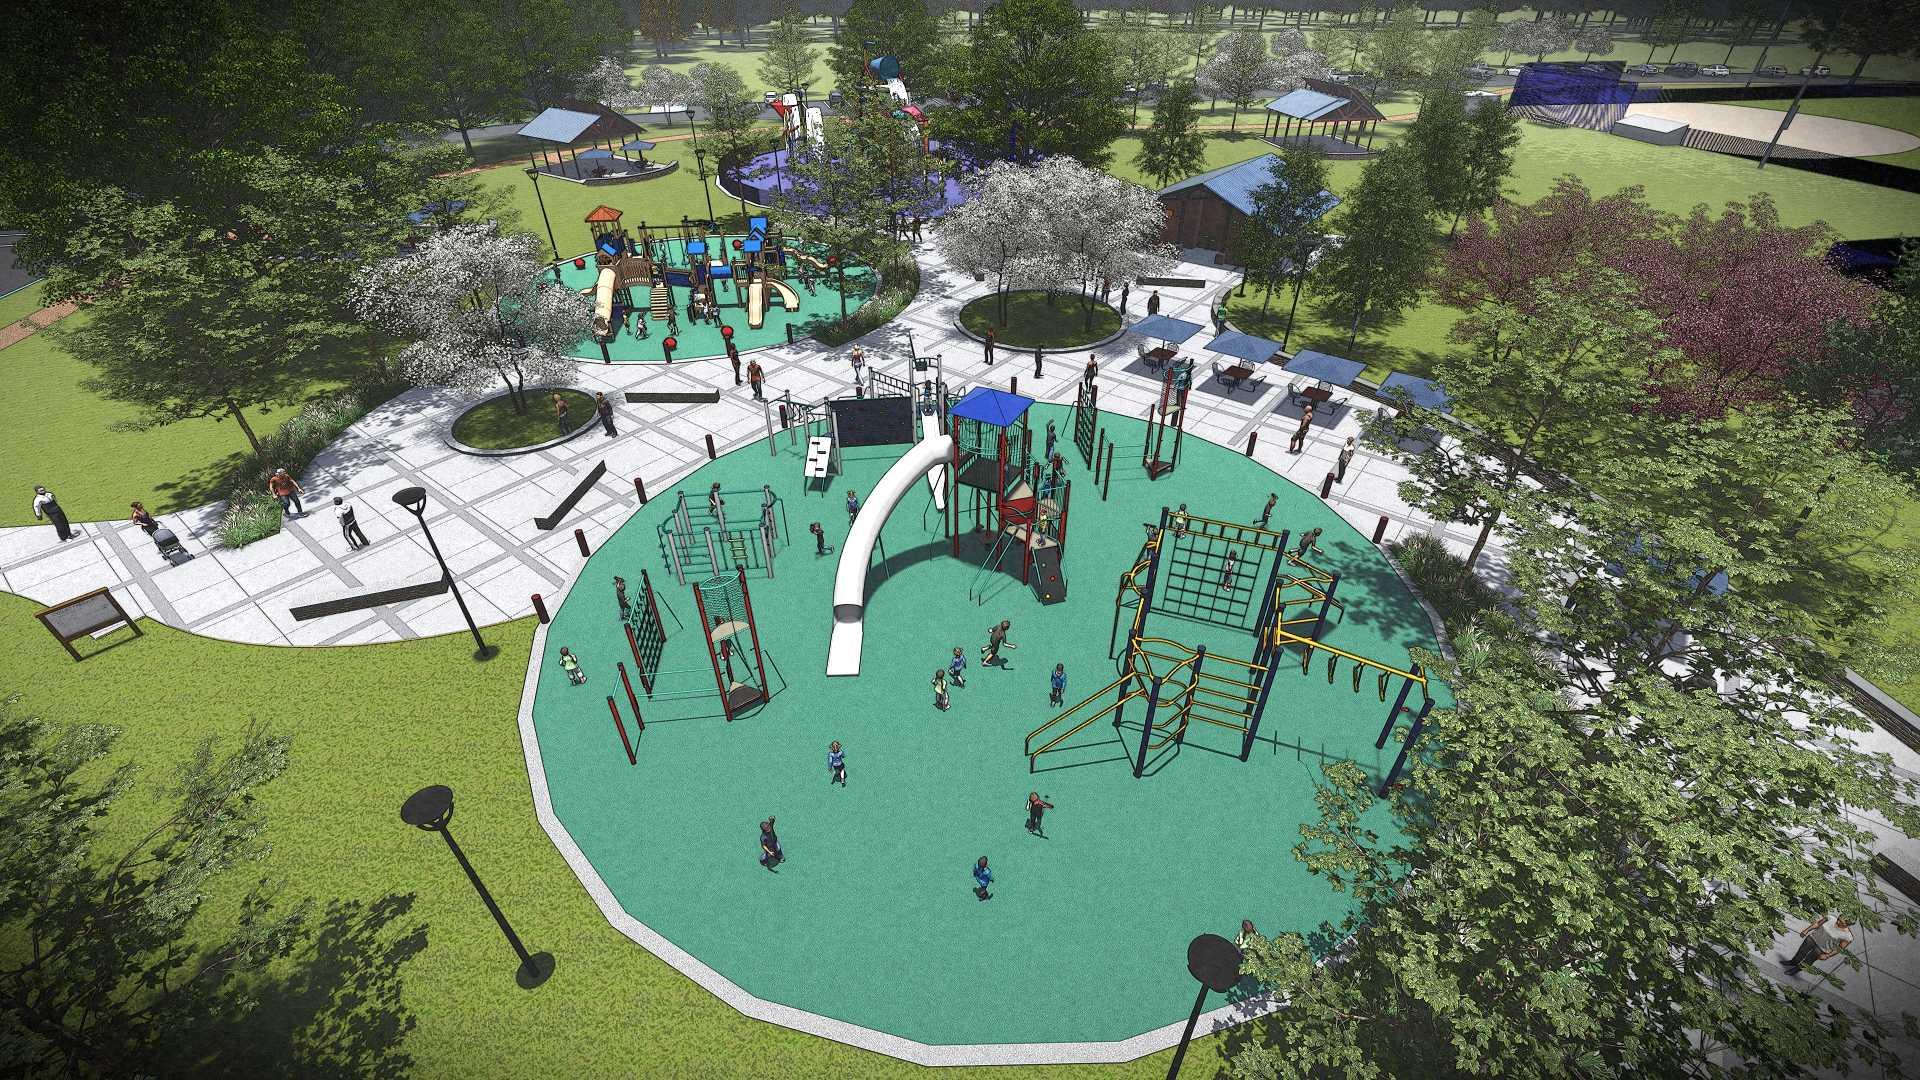 fulton-park-aerial-playground